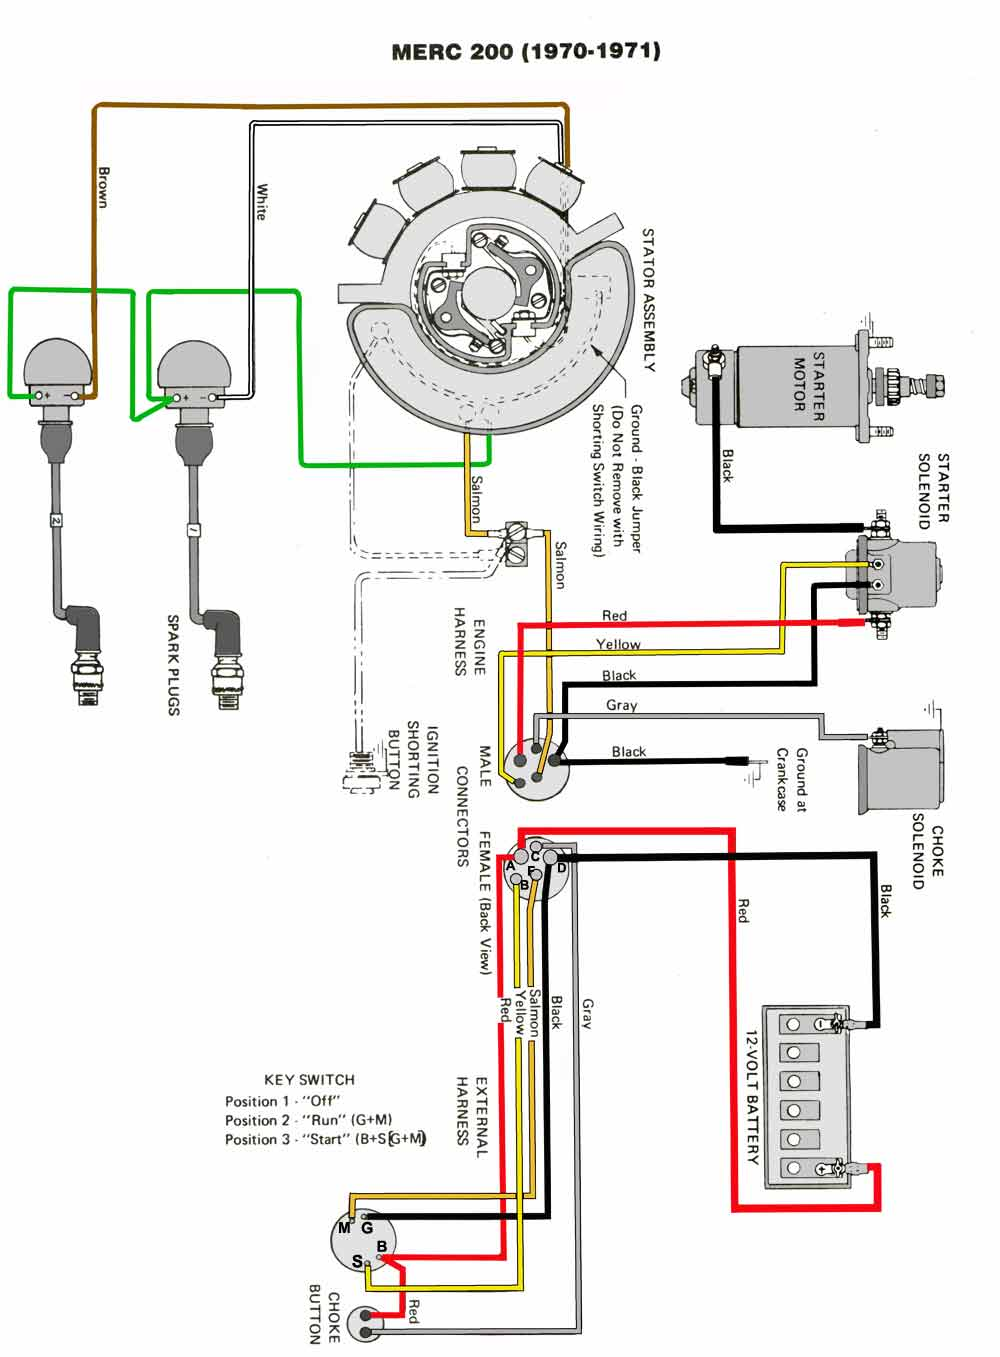 1971 mercury outboard wiring diagram [ 1000 x 1357 Pixel ]